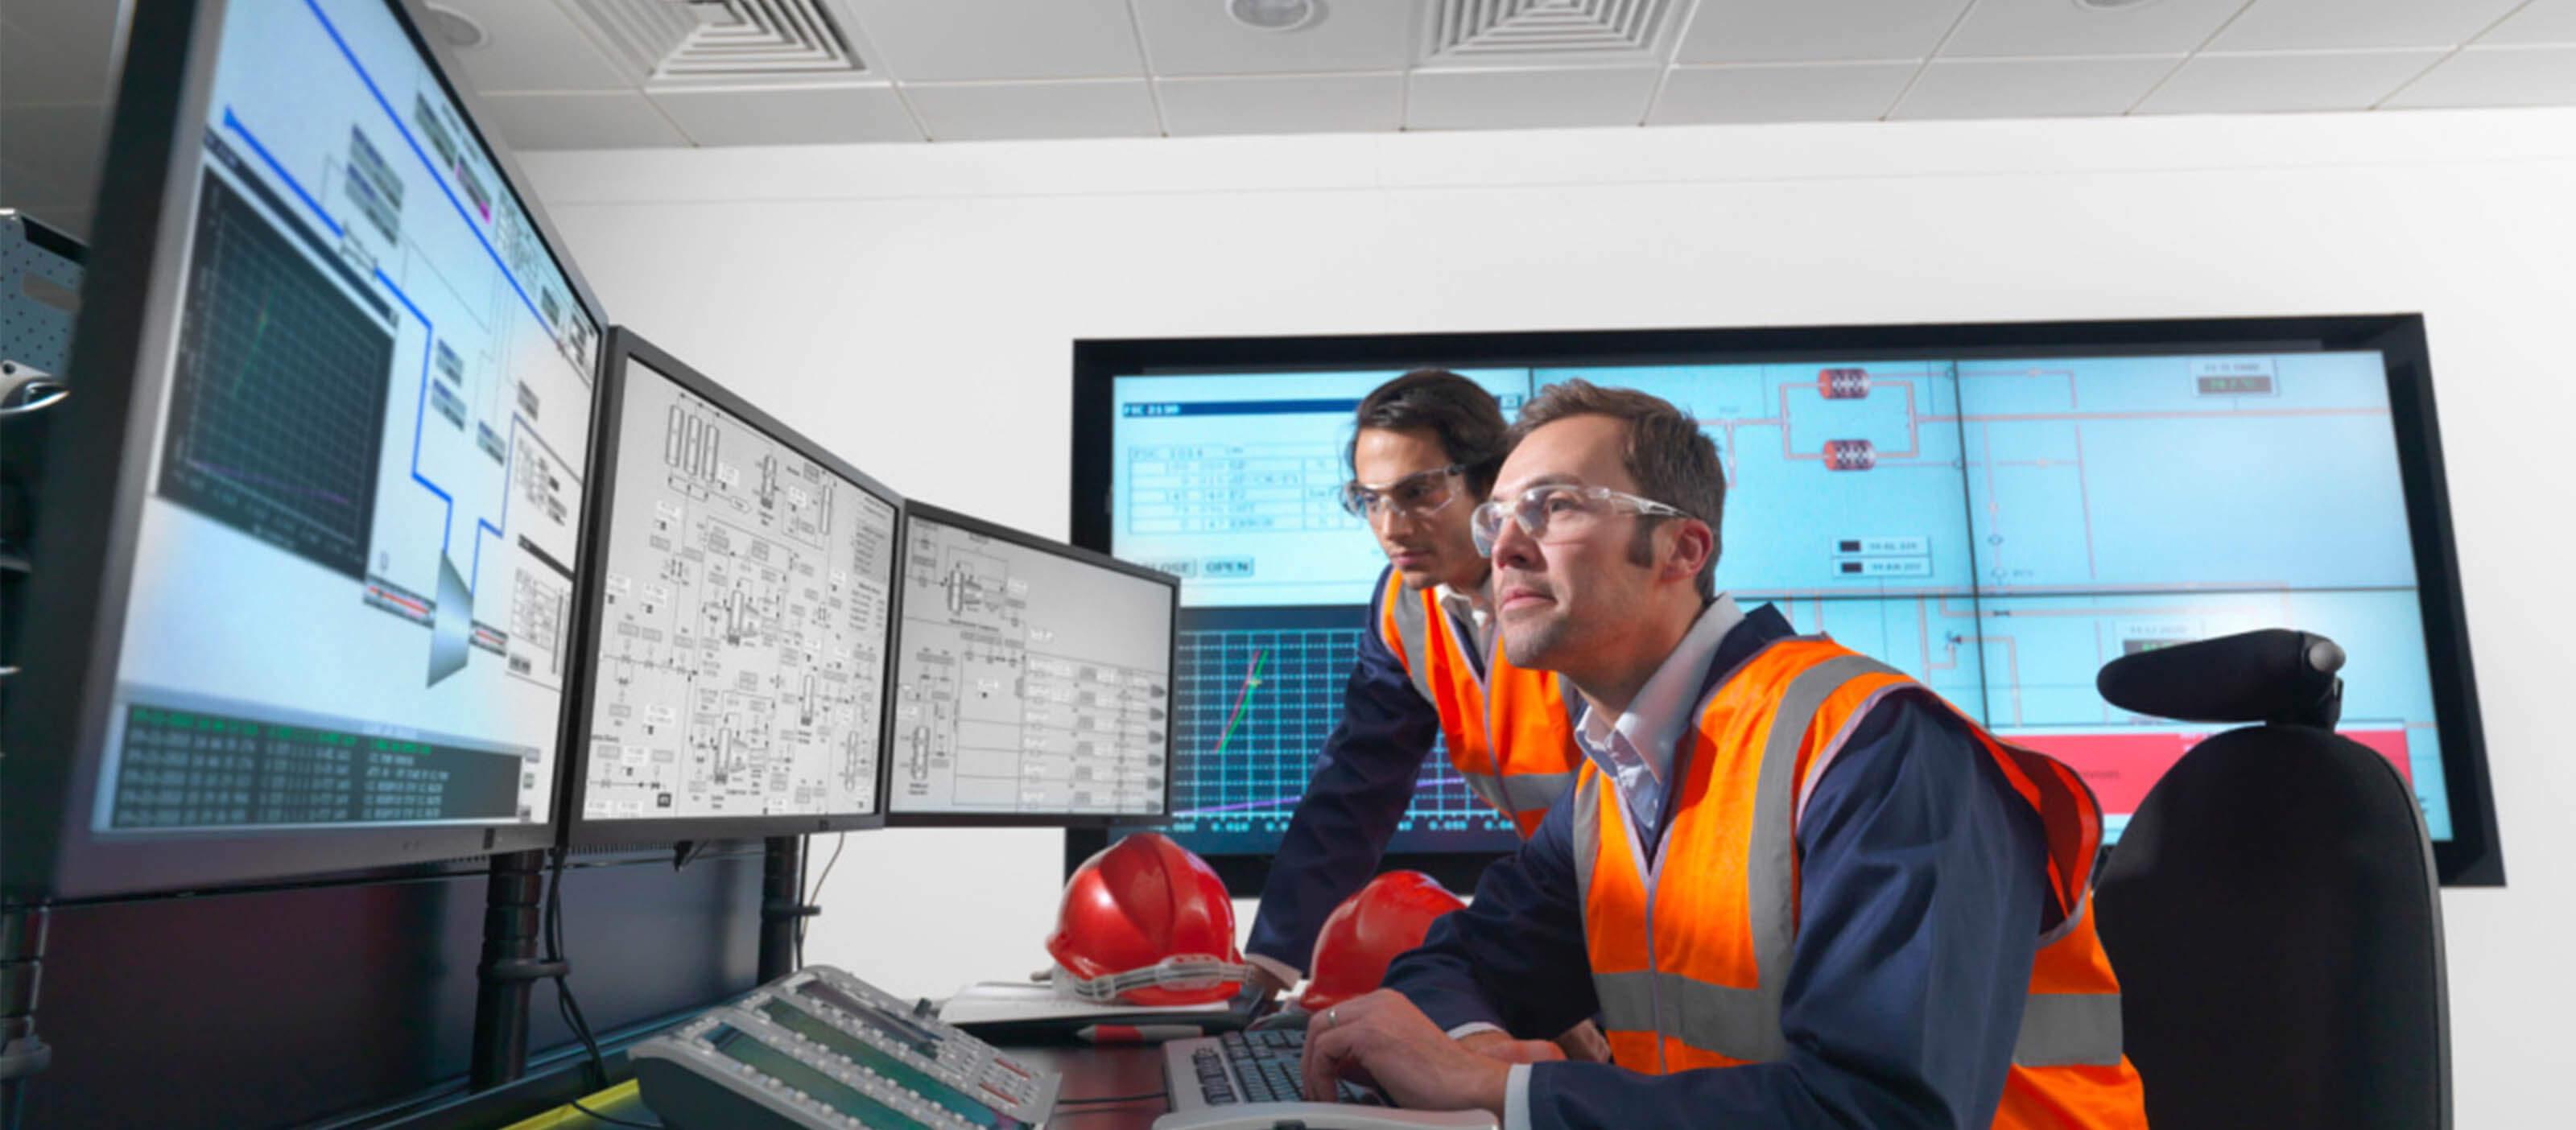 Control room with iFIX Productivity Tools | GE DigitalControl room with iFIX Productivity Tools | GE Digital